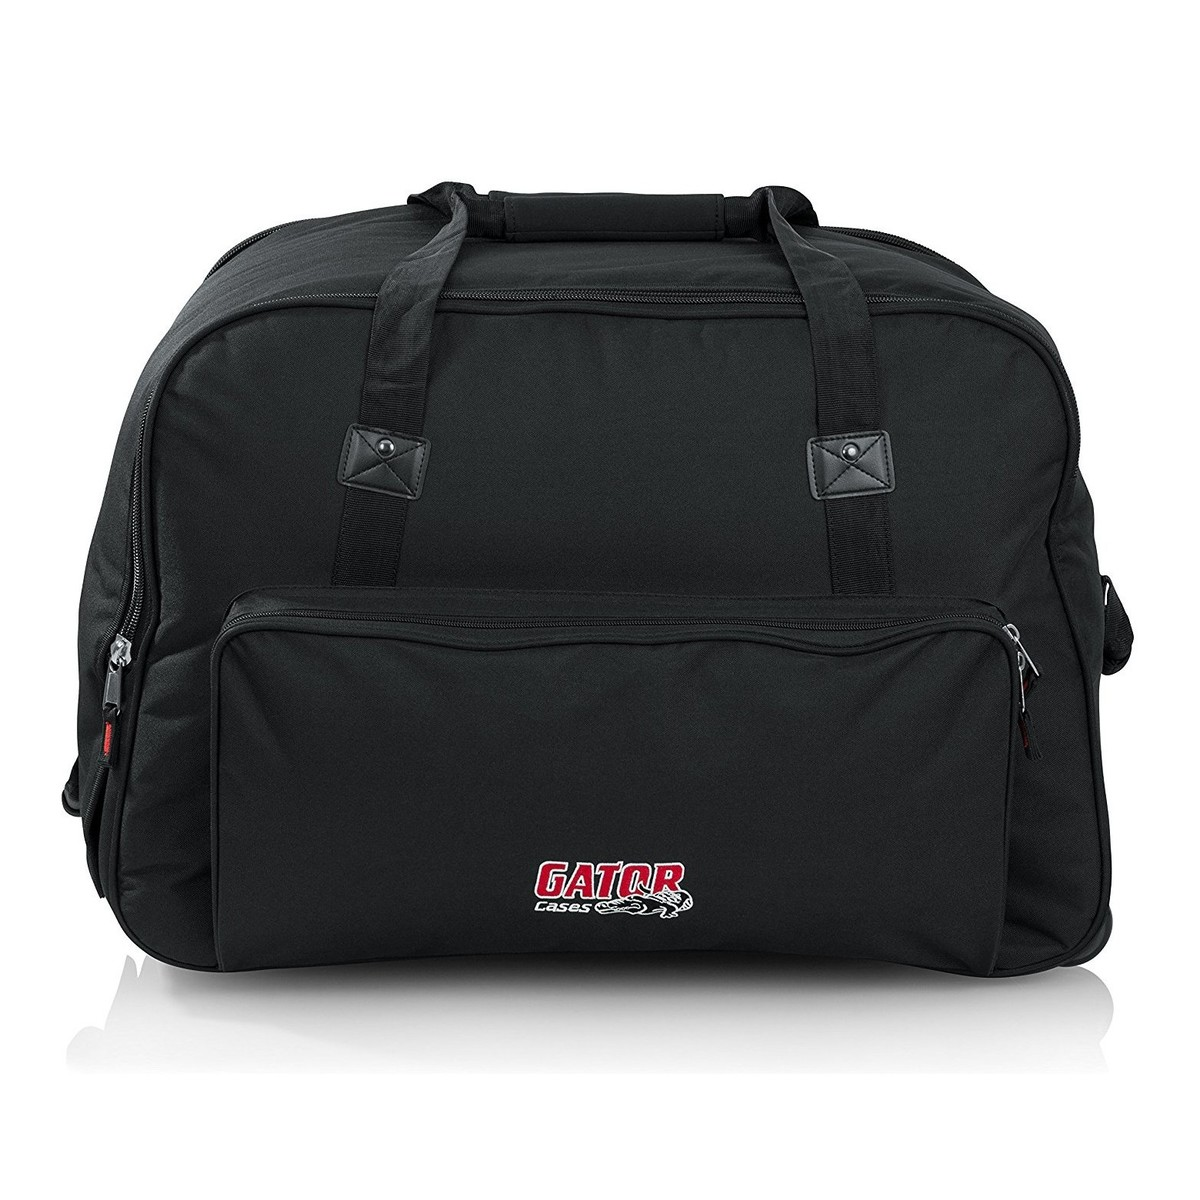 gator gpa 712sm small format 12 39 39 portable speaker bag with wheels gear4music. Black Bedroom Furniture Sets. Home Design Ideas